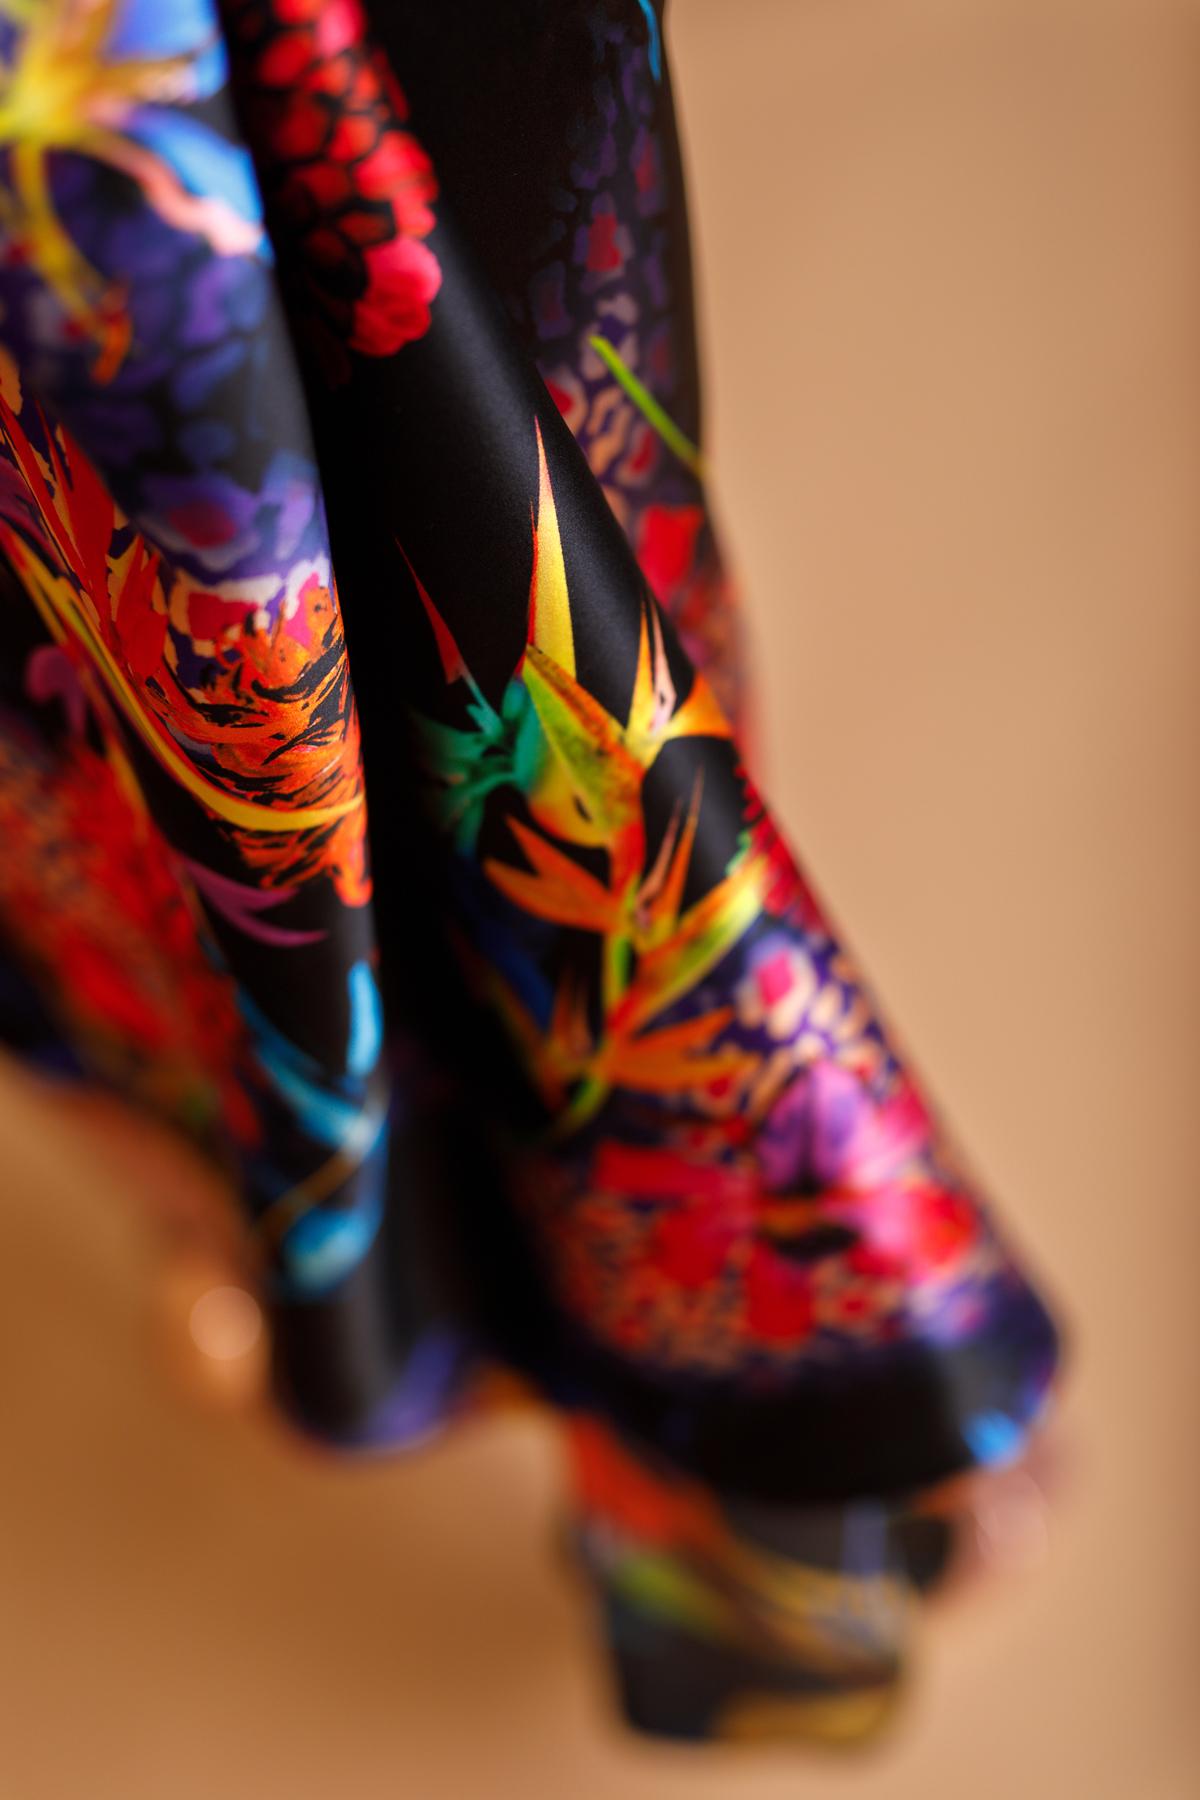 Flowing silk dress by Saskia ter Welle